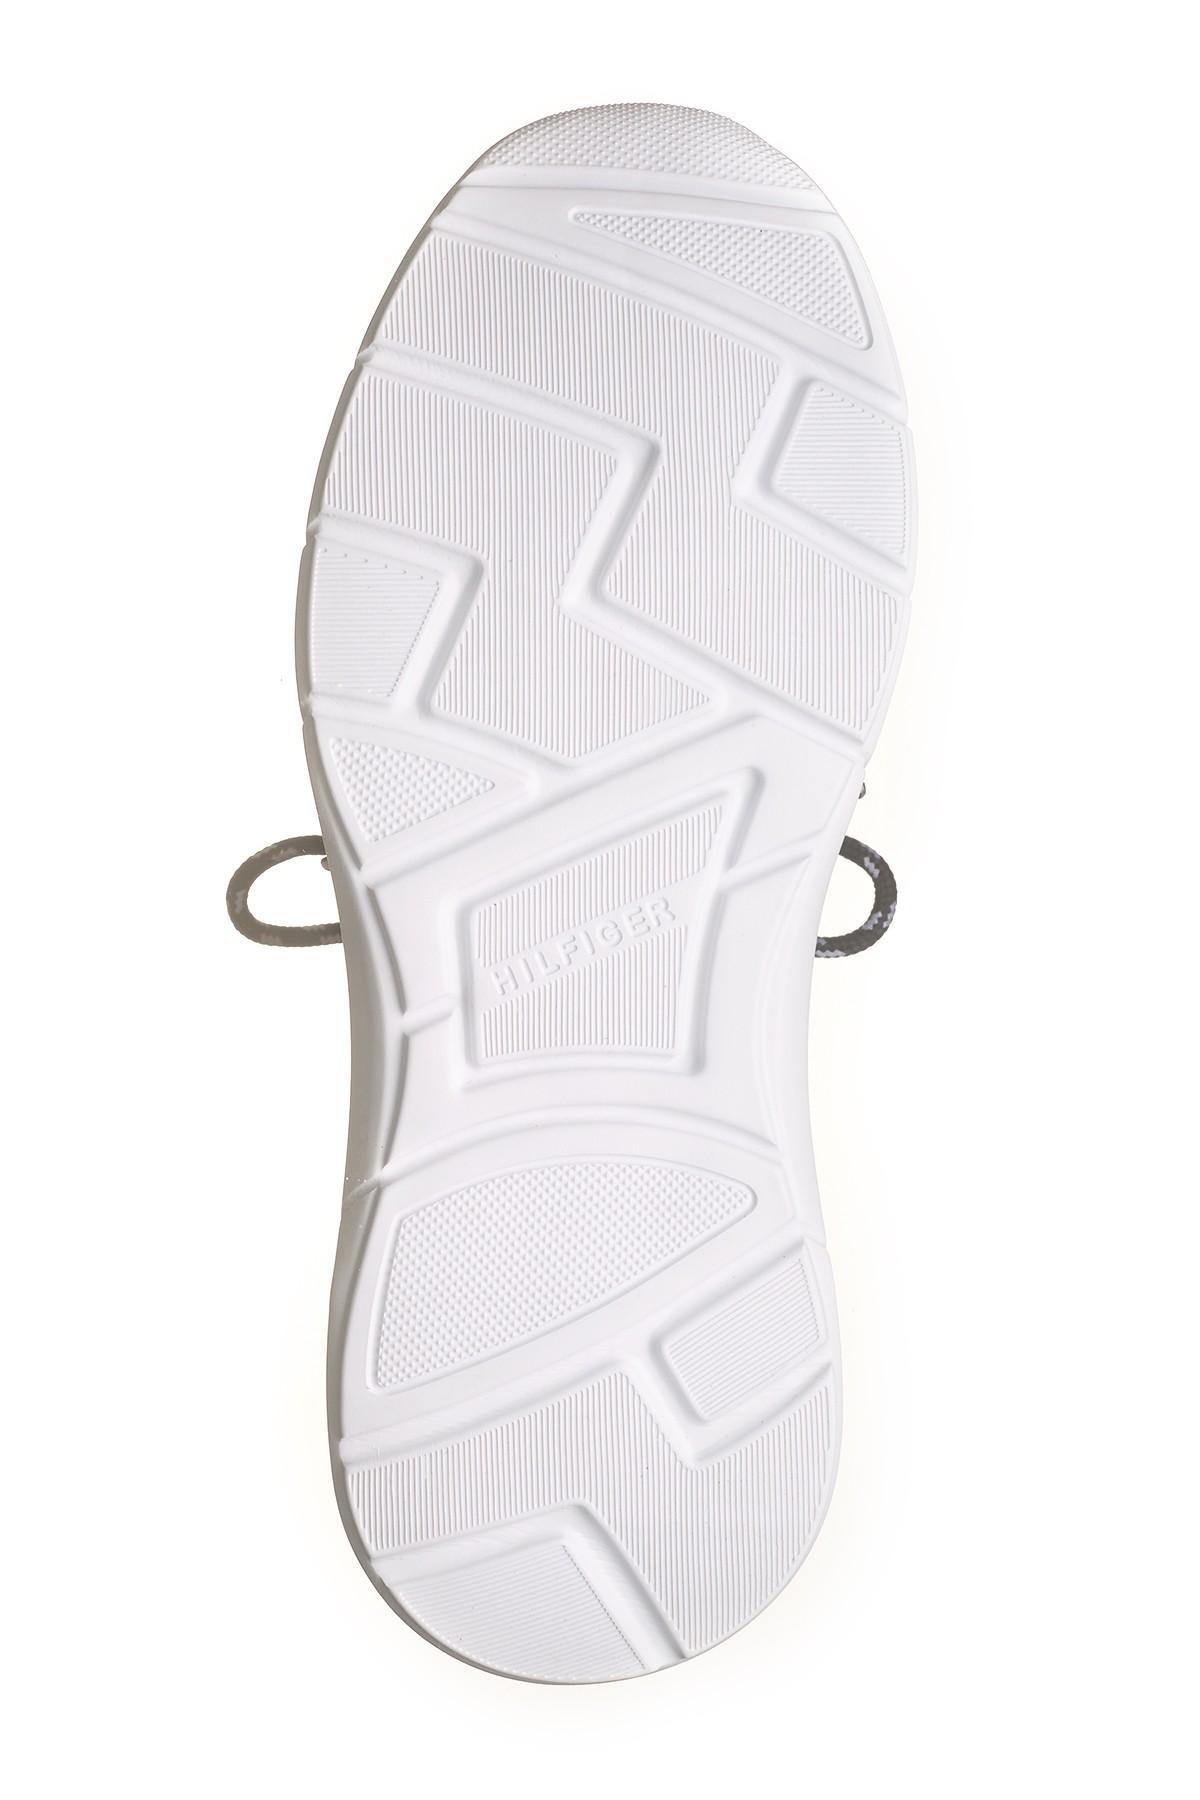 e0afe2d50b09 Lyst - Tommy Hilfiger Cabello Sneaker